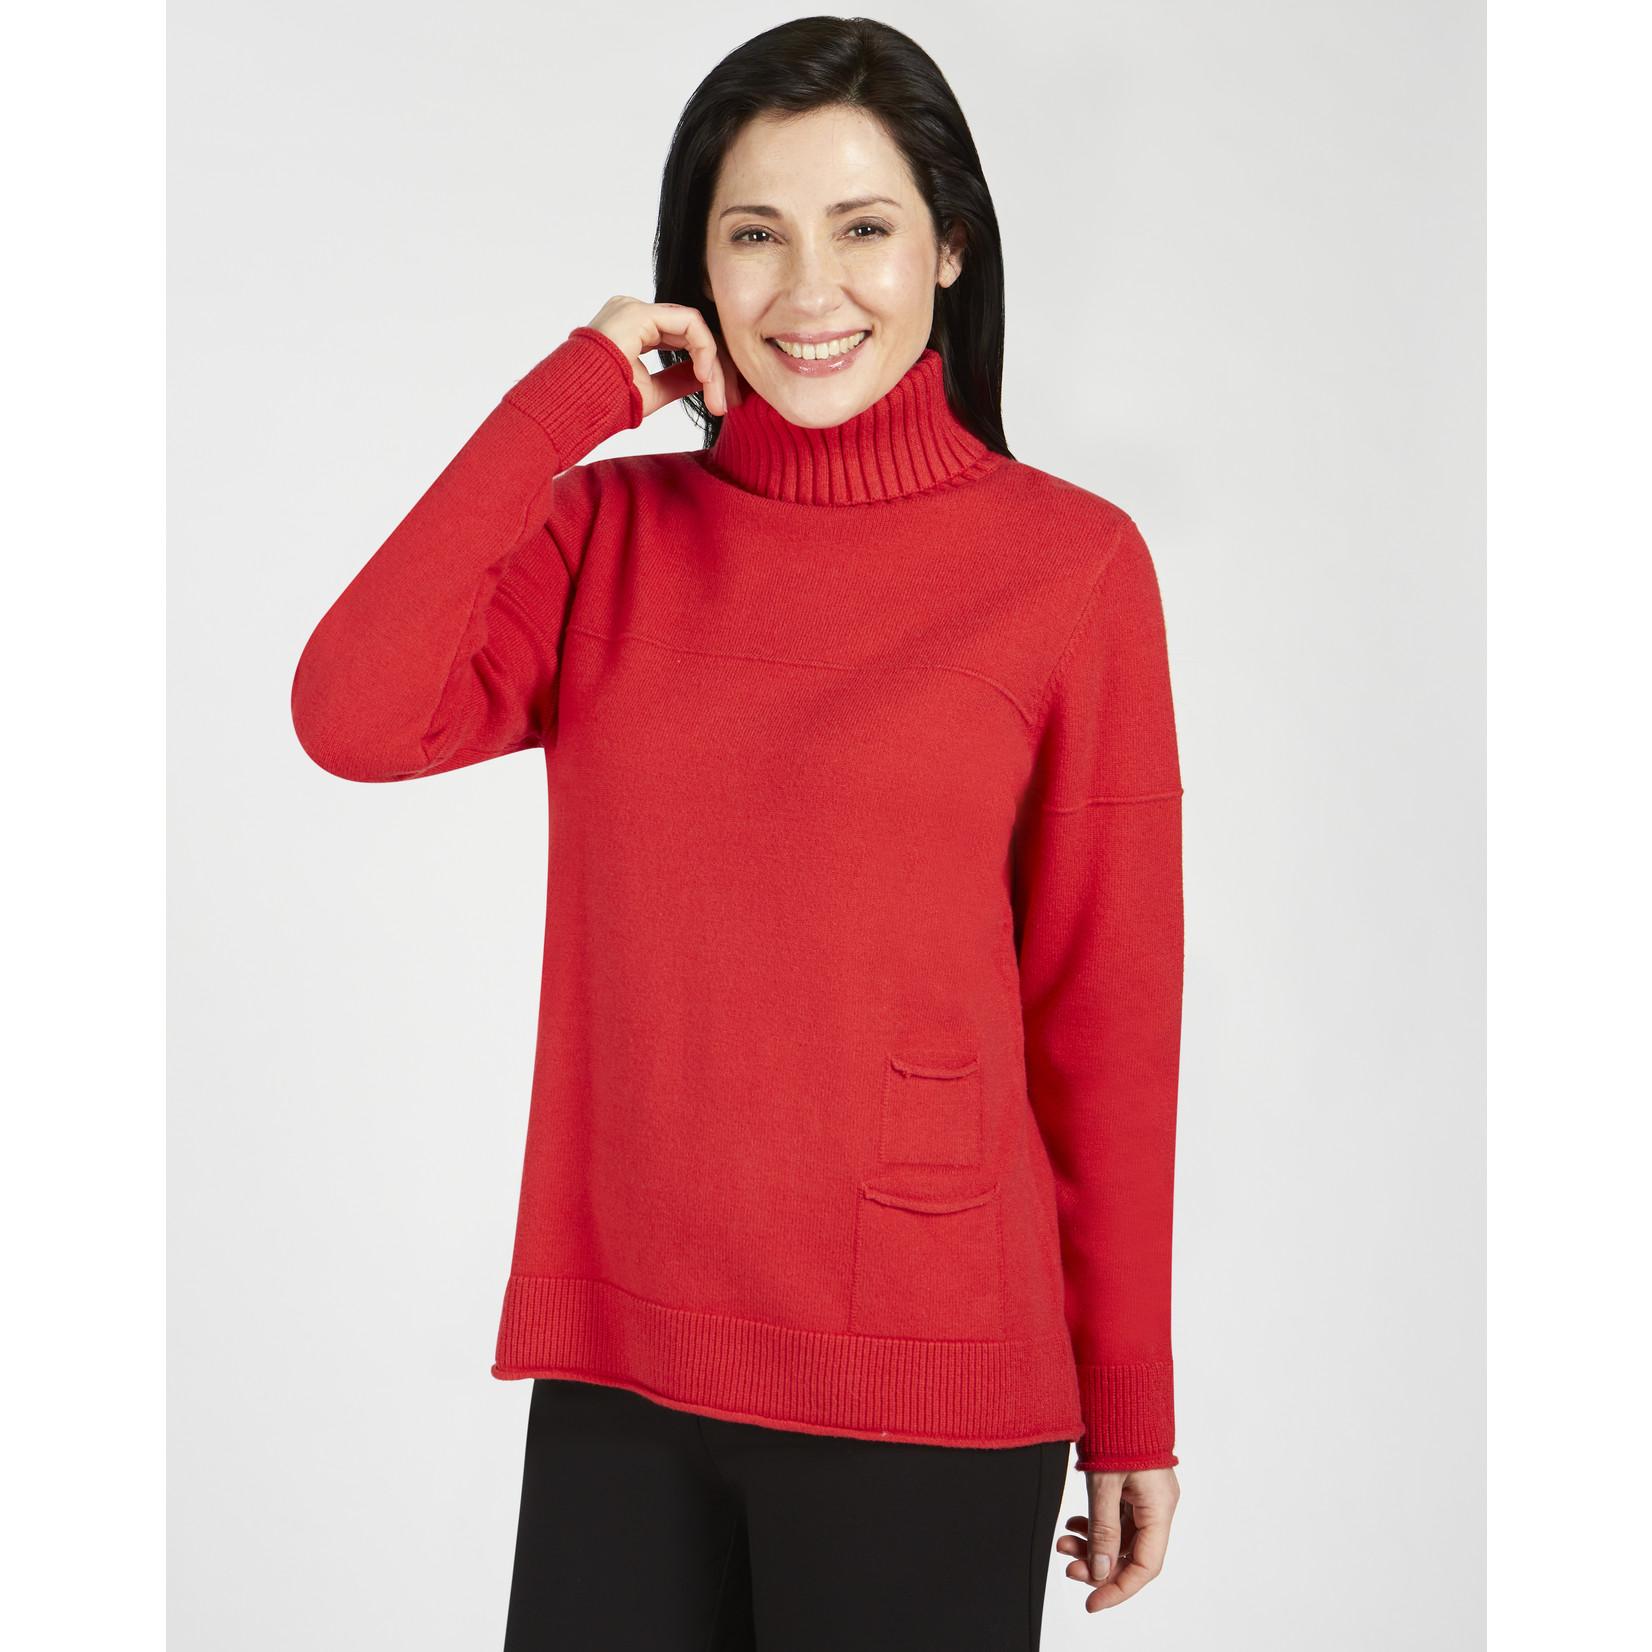 Renuar Knit Sweater (3 Colors)